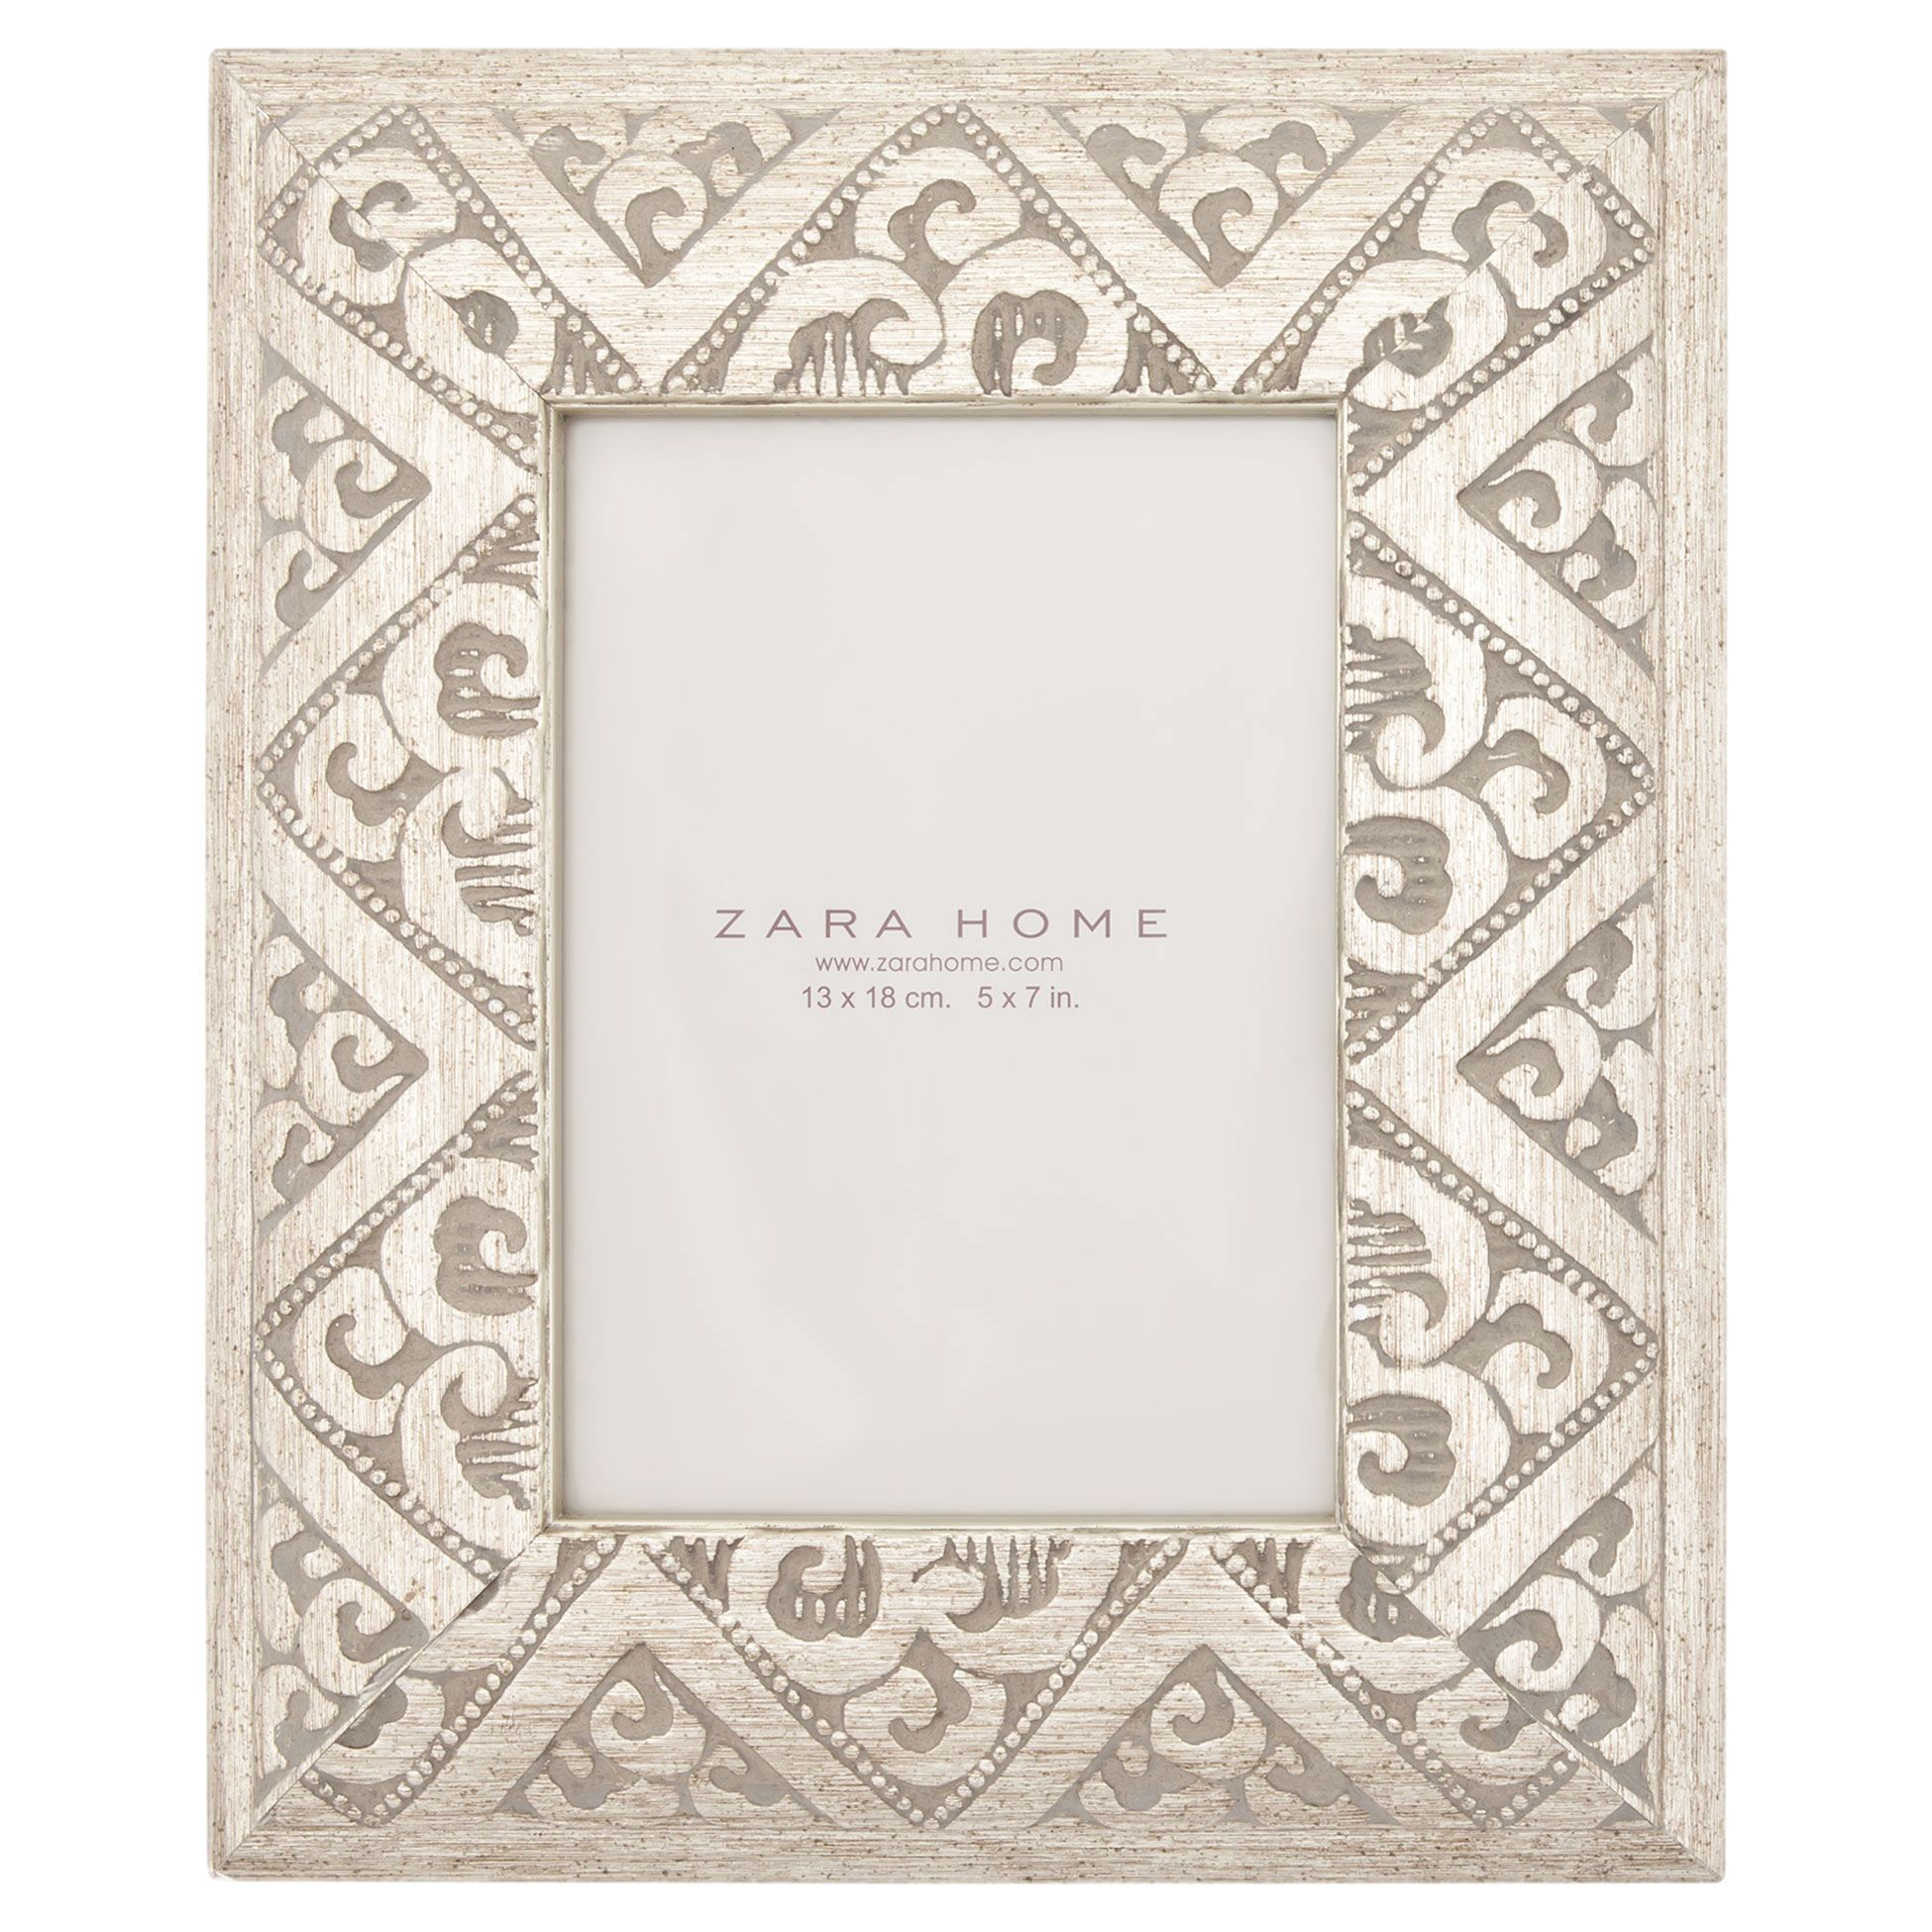 ef47119e4b32 Zara Home New Collection. Carved Wood Frame - Frames - Decor